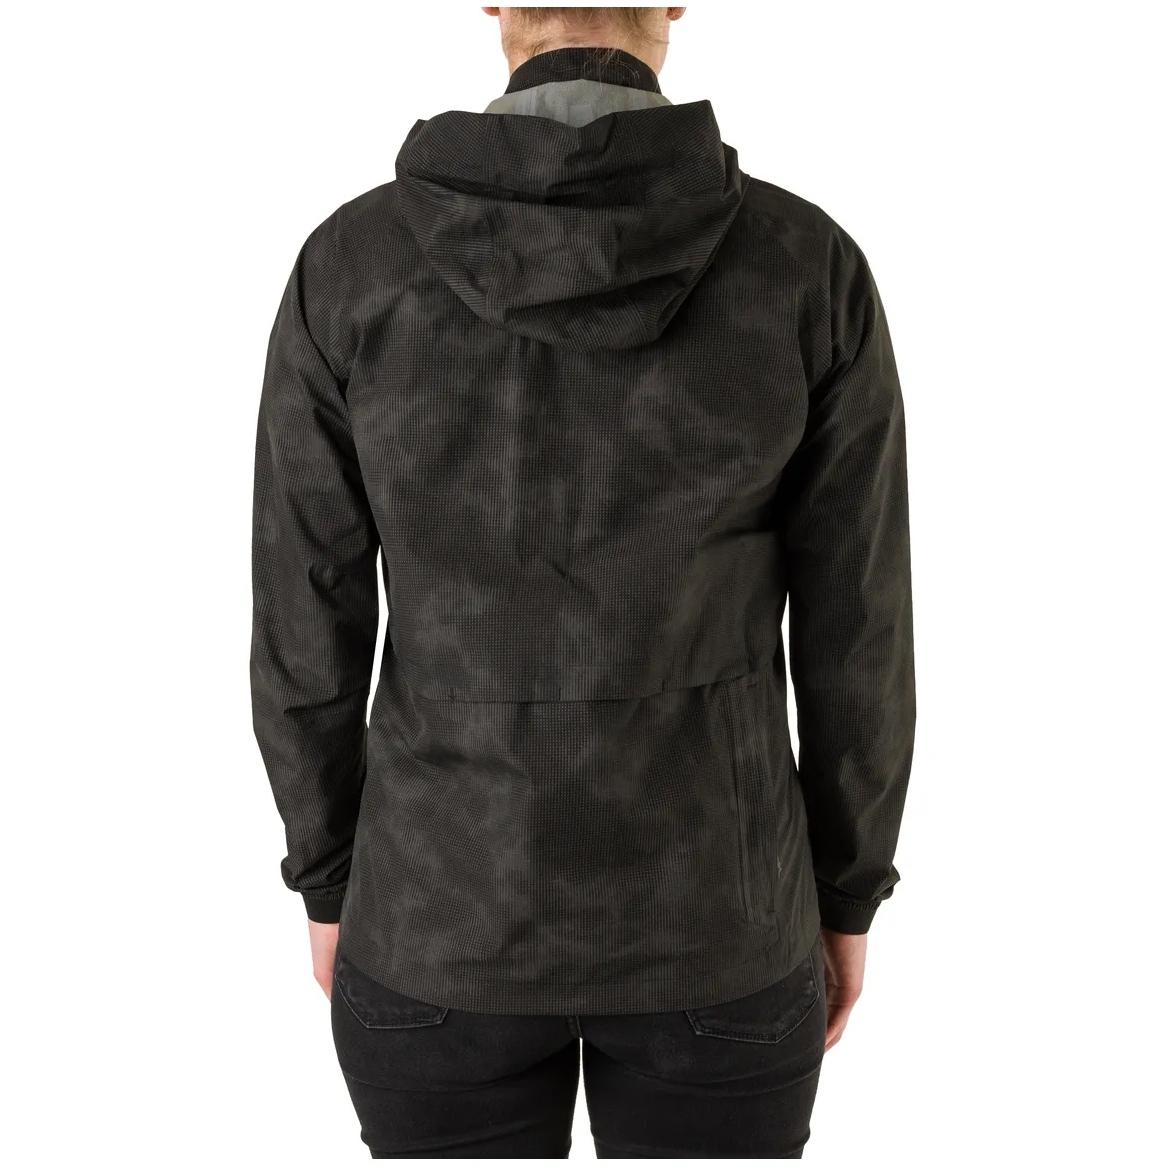 Image of AGU Commuter Compact Rain Jacket Women - reflection black